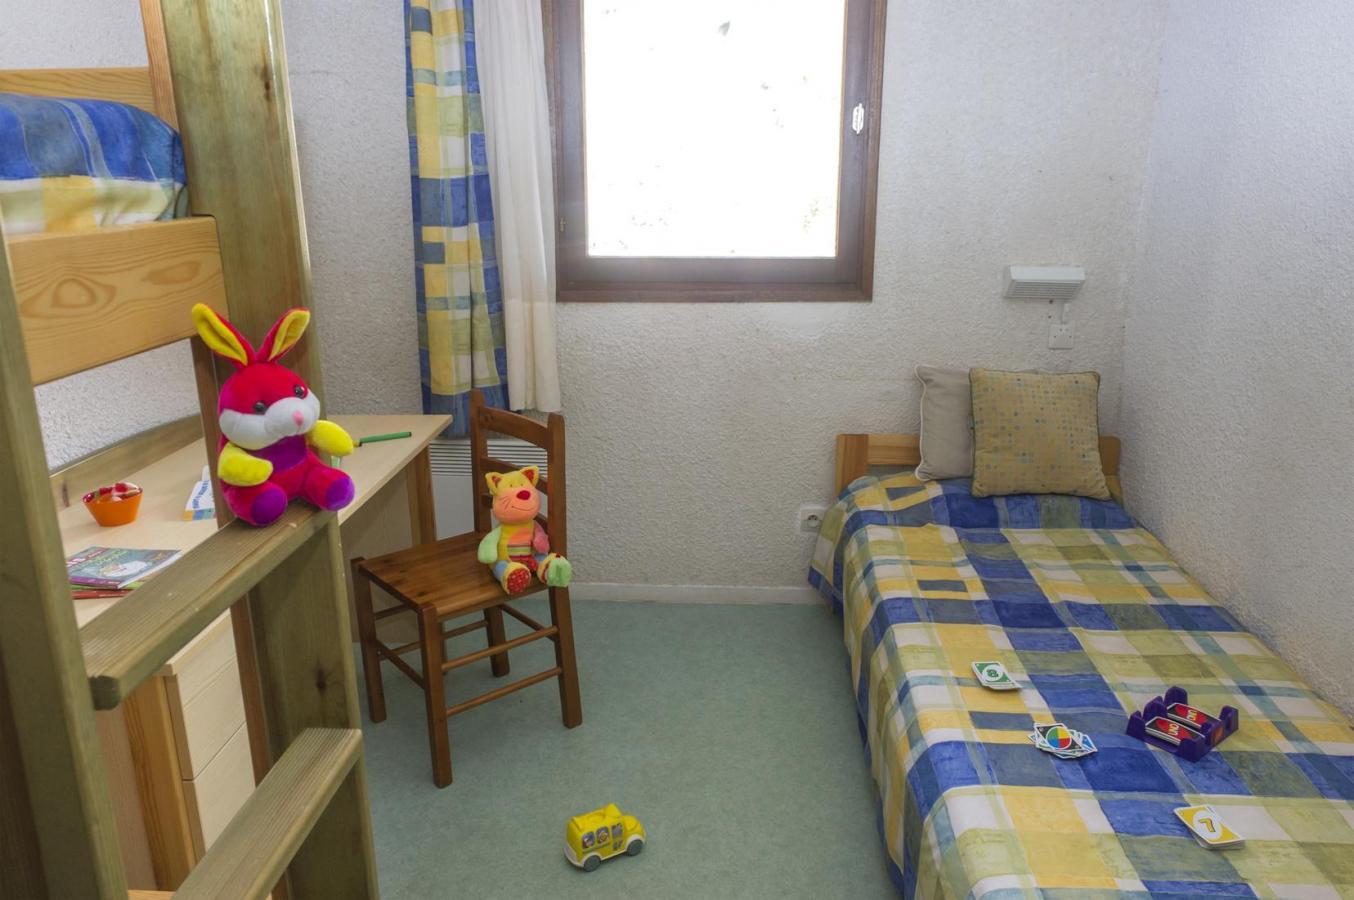 Location au ski Appartement 4 pièces 7 personnes - Residence Les Gorges Rouges - Valberg / Beuil - Chambre